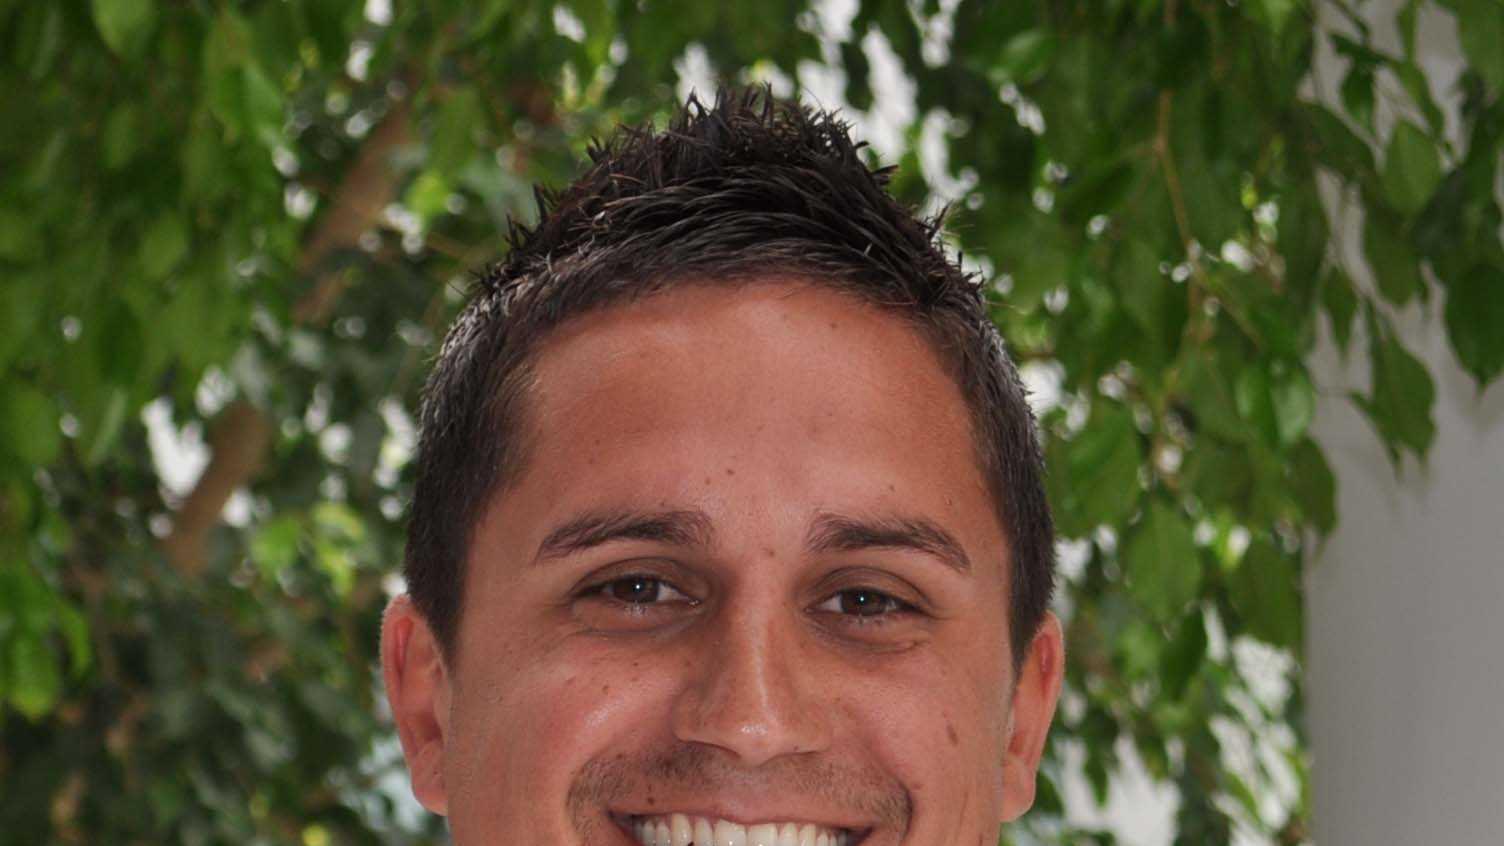 Sam Lopes